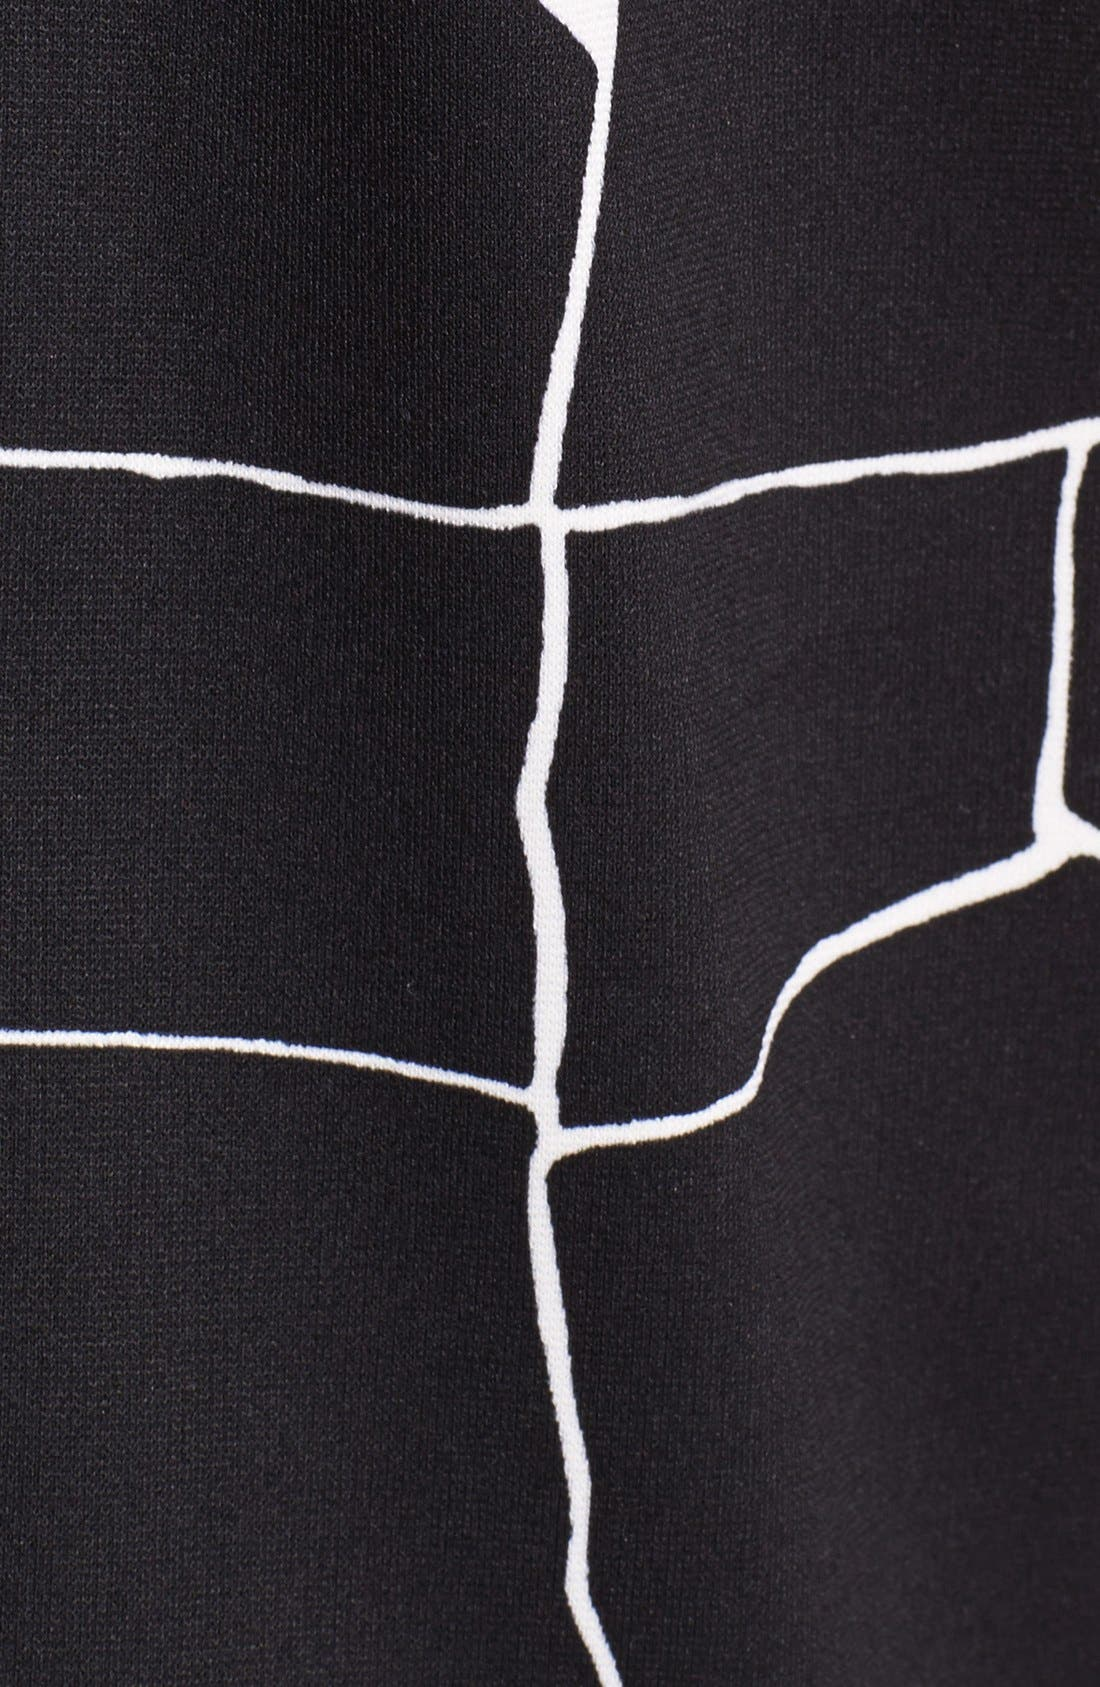 Alternate Image 5  - Vince Camuto Faux Patent Leather Trim Print Pencil Skirt